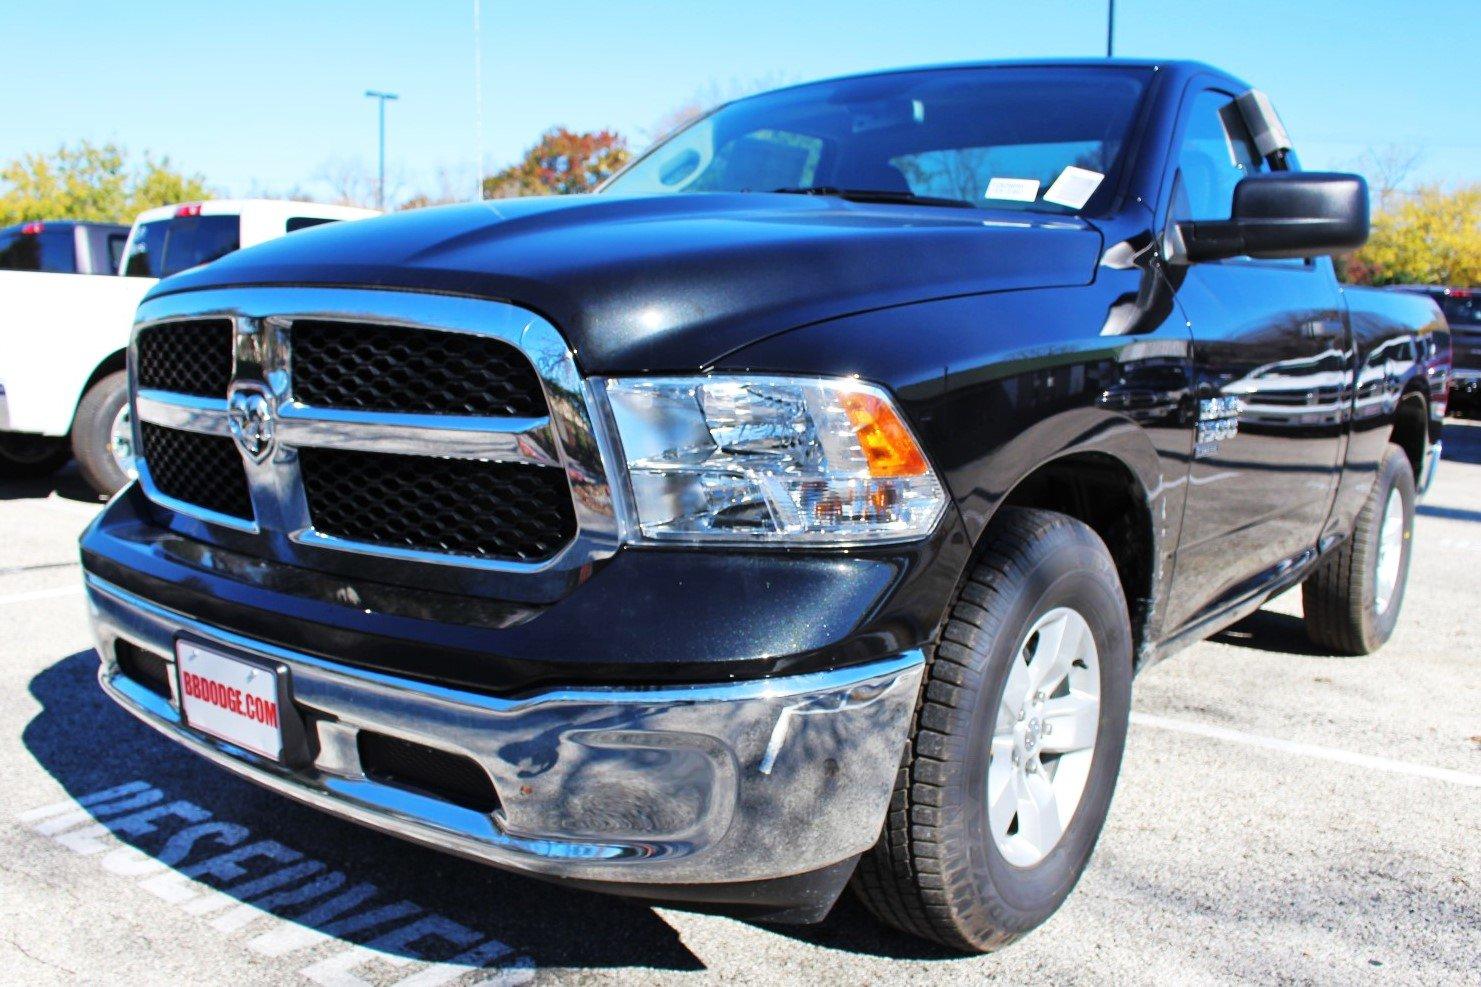 Bluebonnet Chrysler Dodge Ram Serving San Antonio